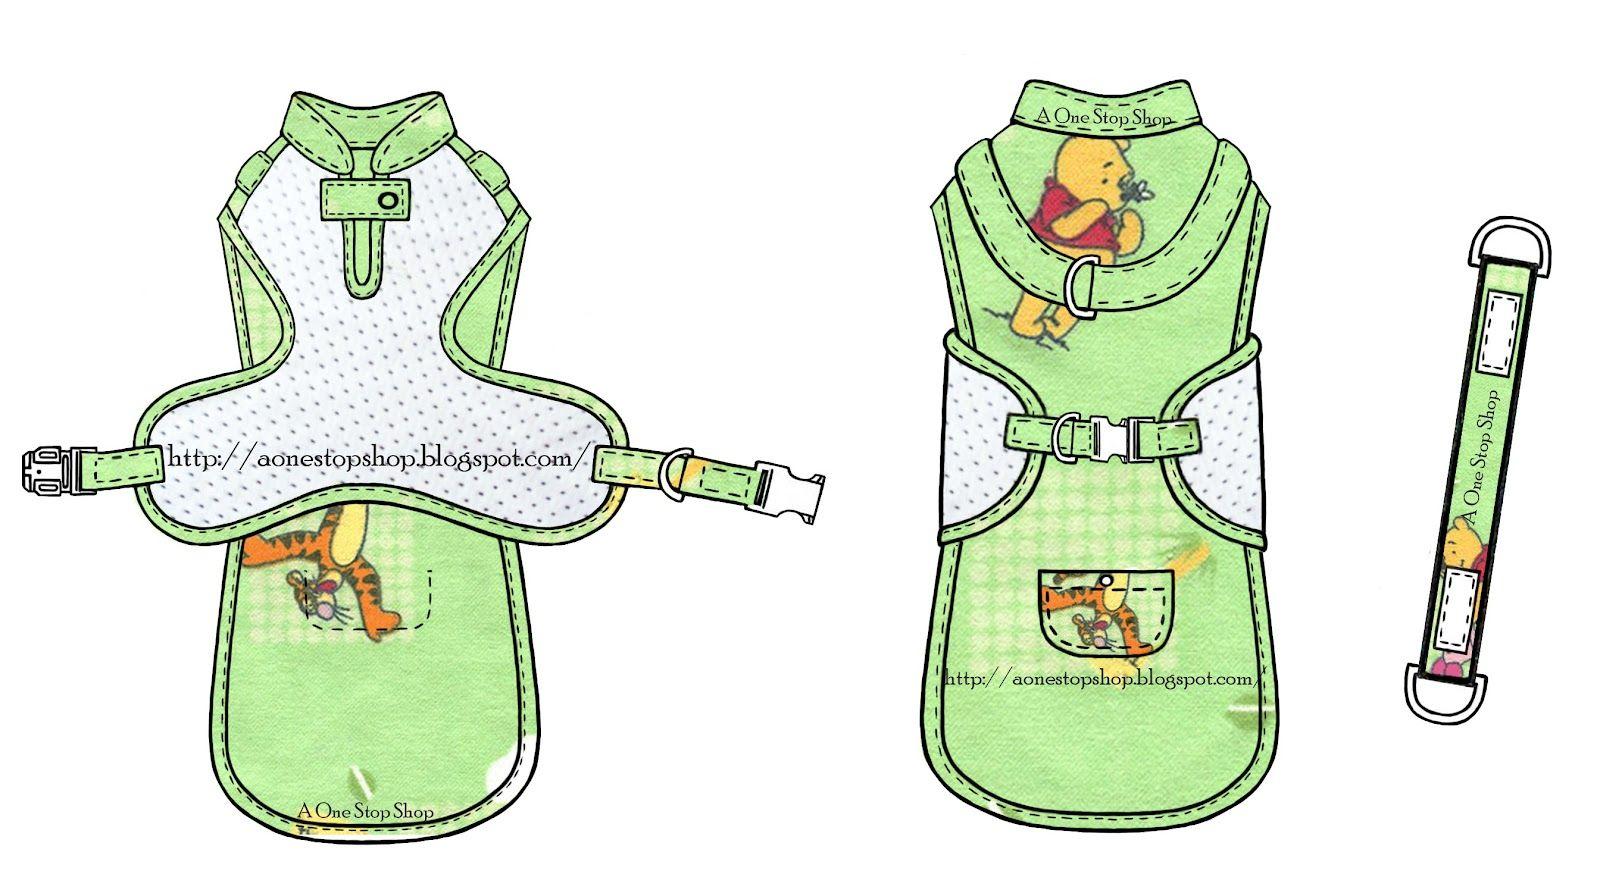 25 FREE Dog Clothing Ideas & Patterns - Page 5 of 5 | vestidos para ...